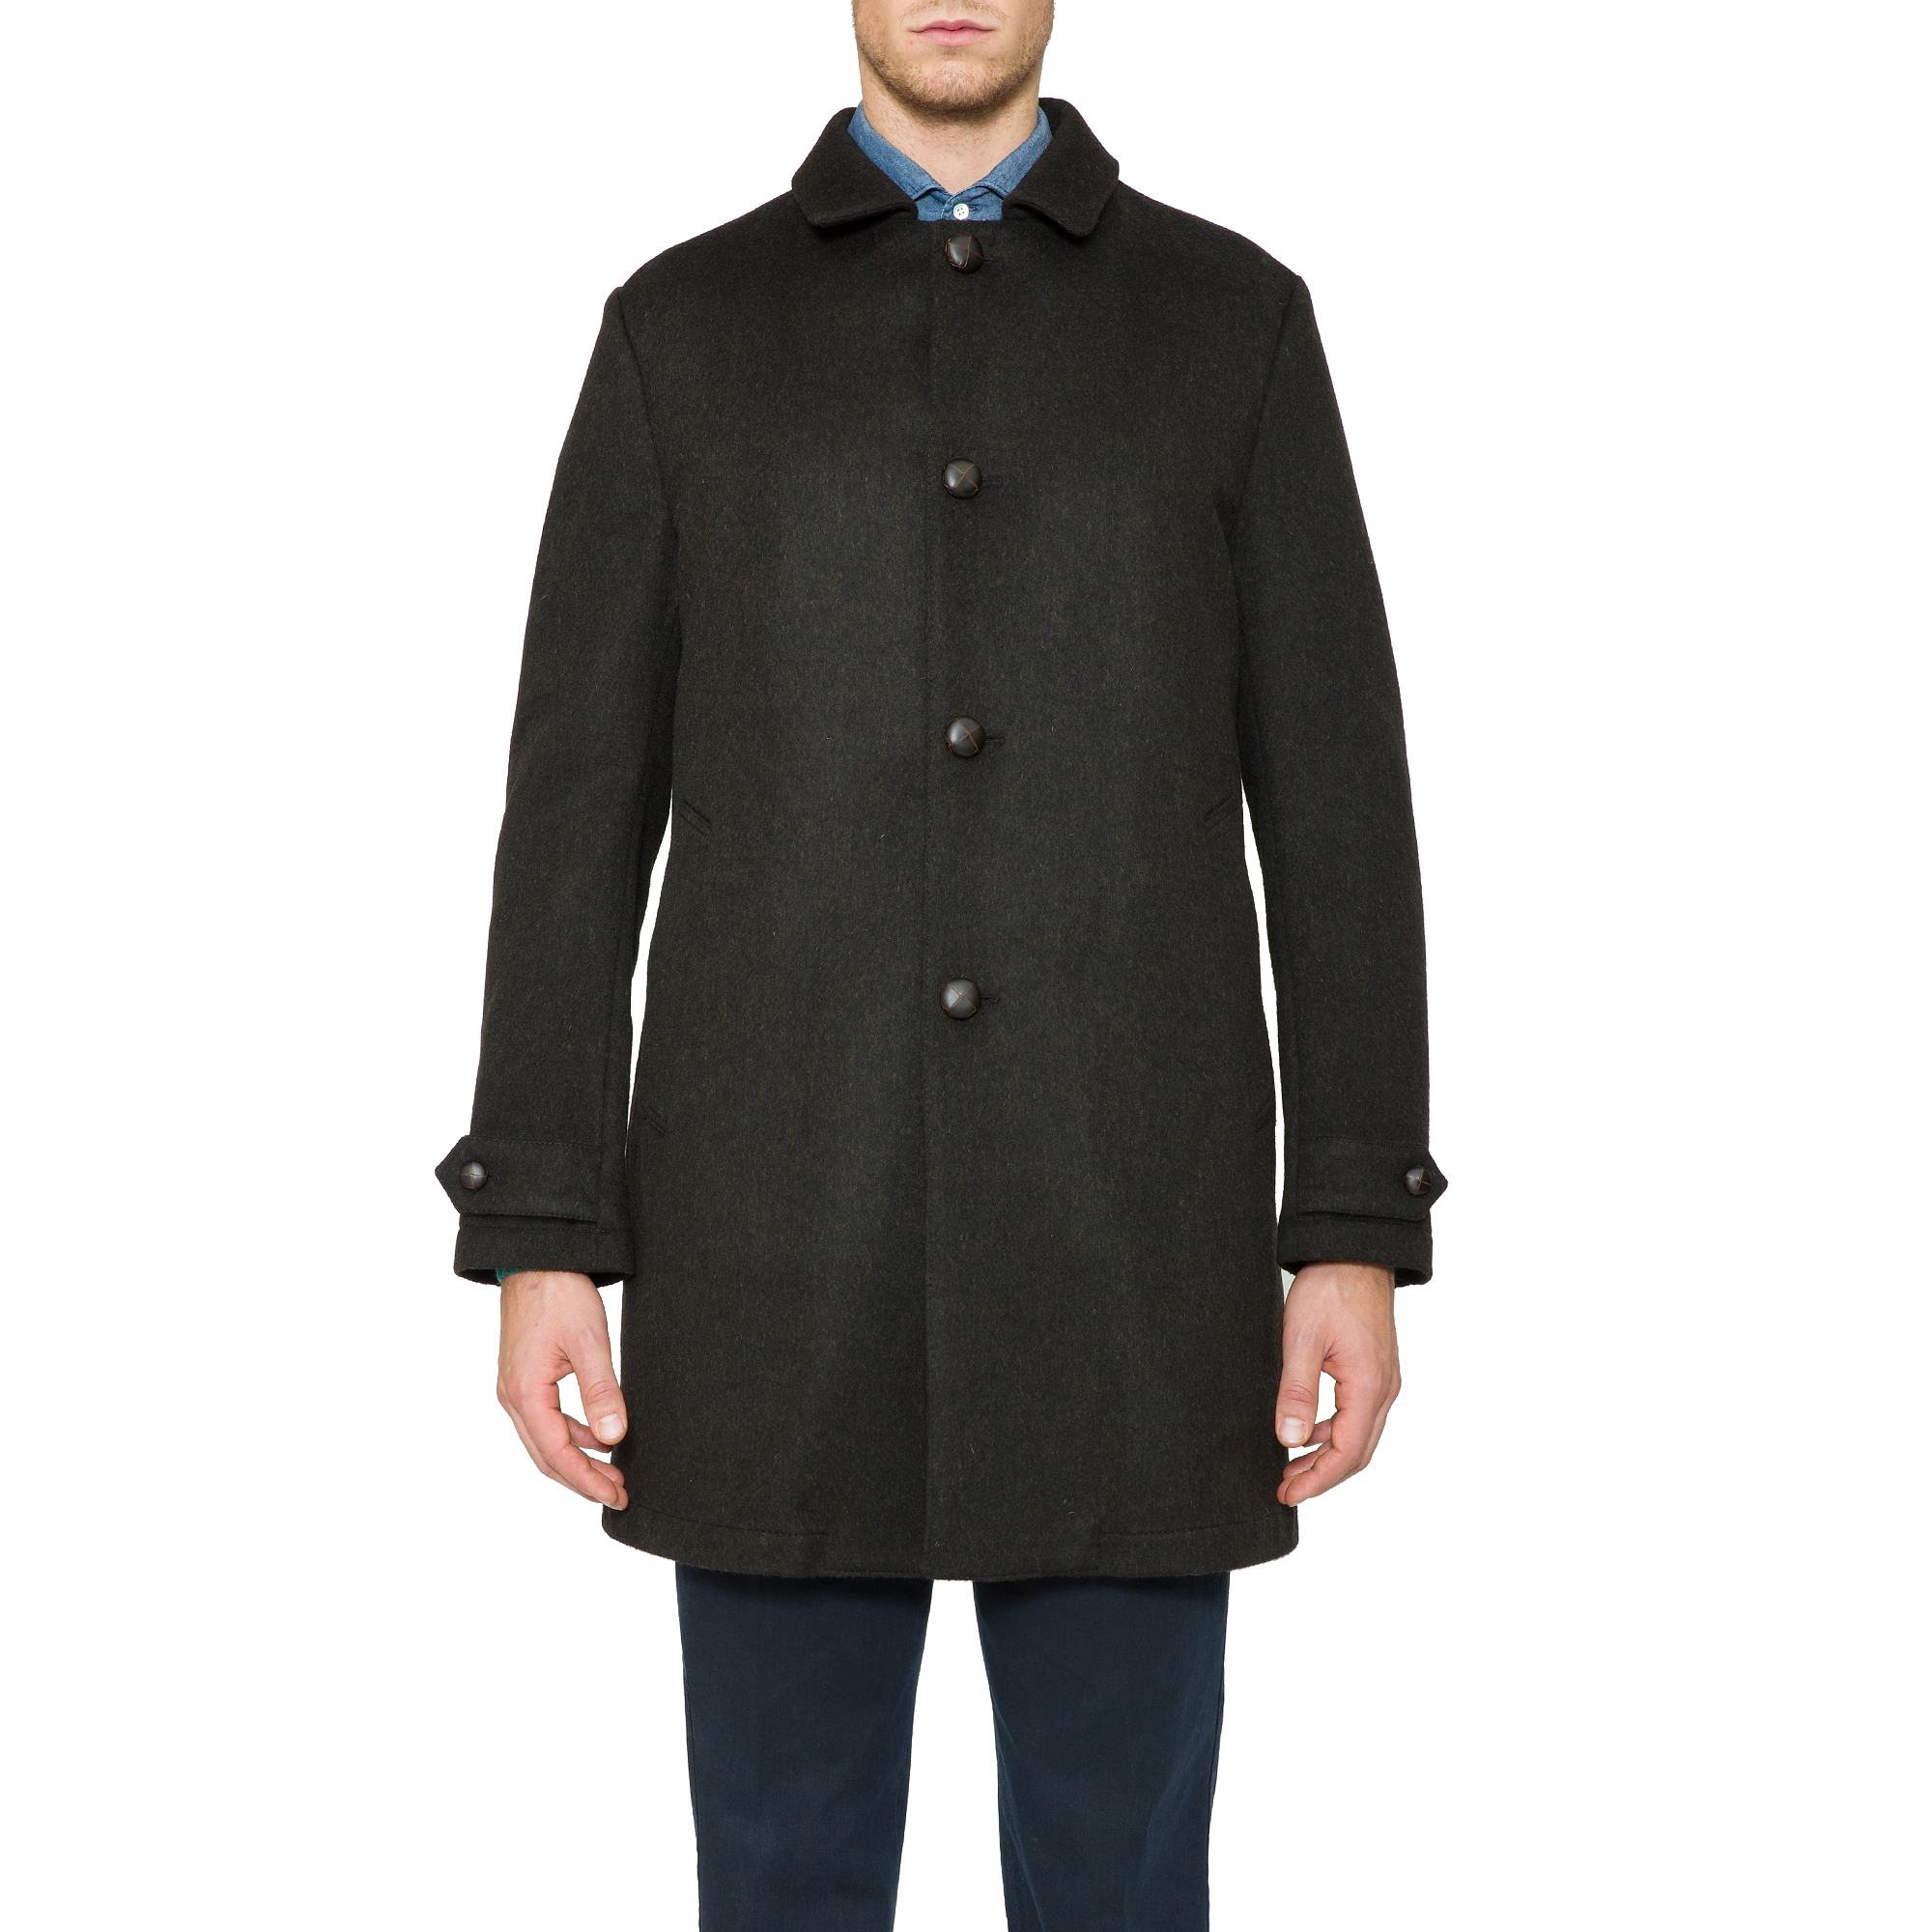 Aspesi Loden Wool Perfetto Coat In Dark Green Green For